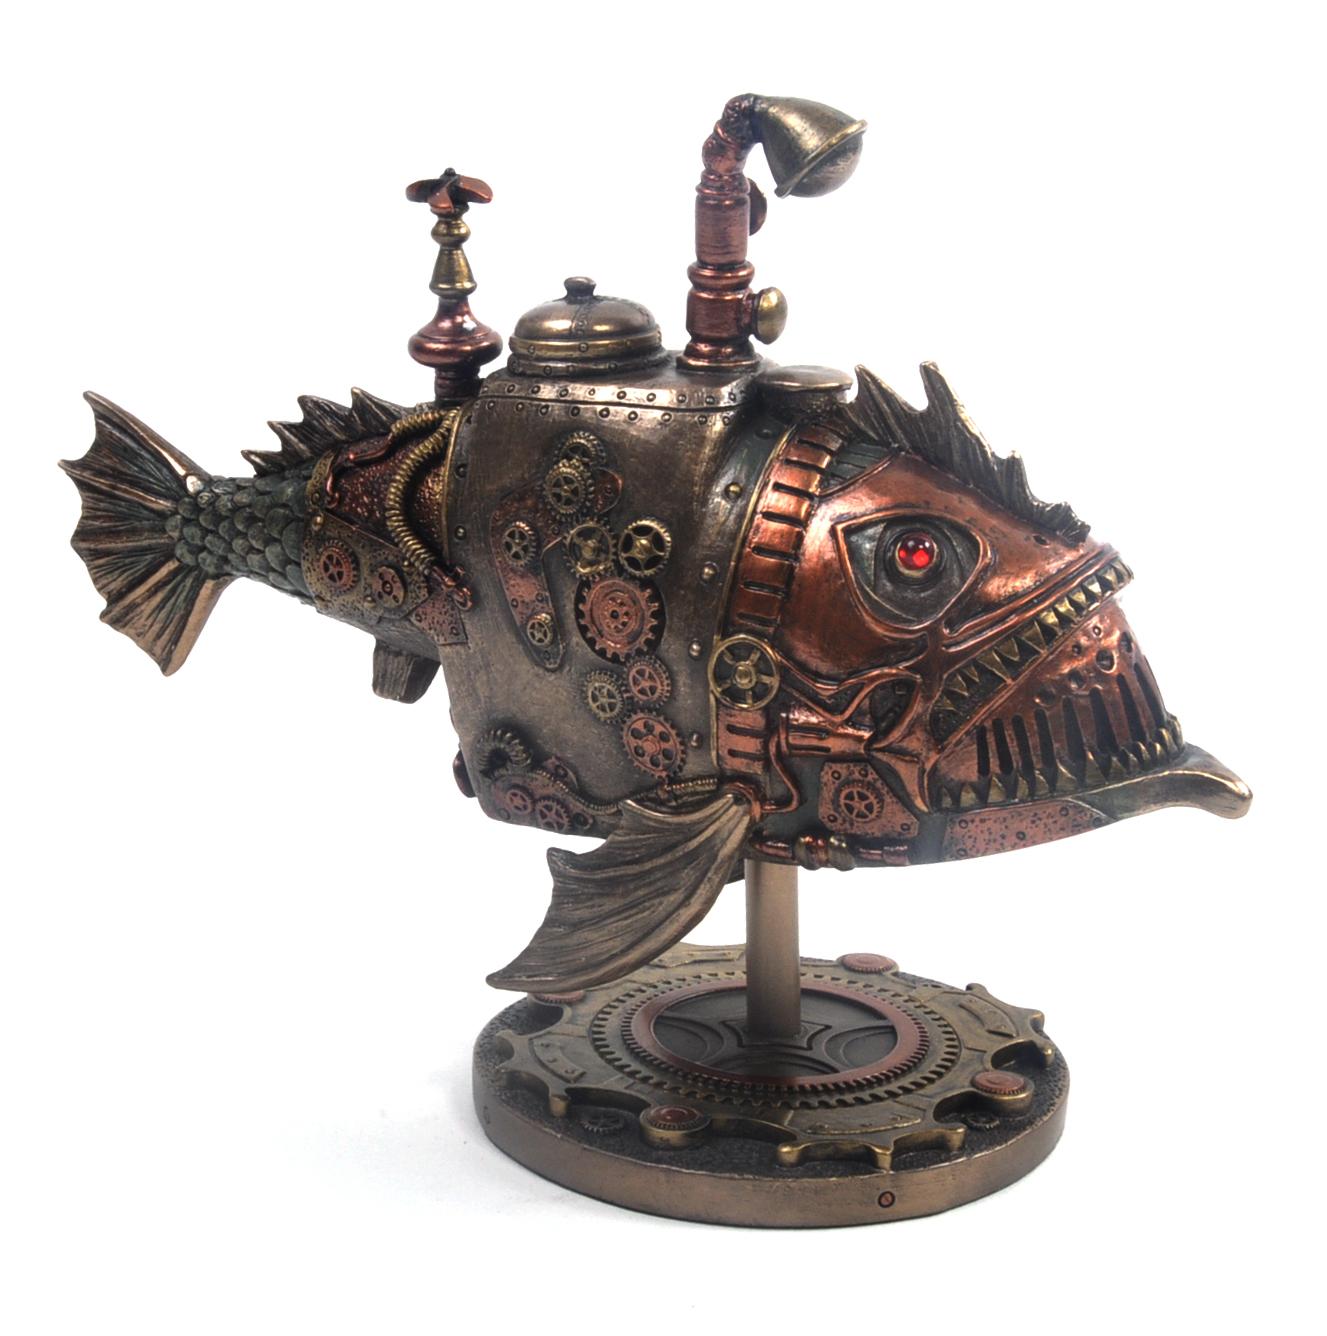 Sub Piranha Steampunk Sculpture 22 5cm Pink Cat Shop